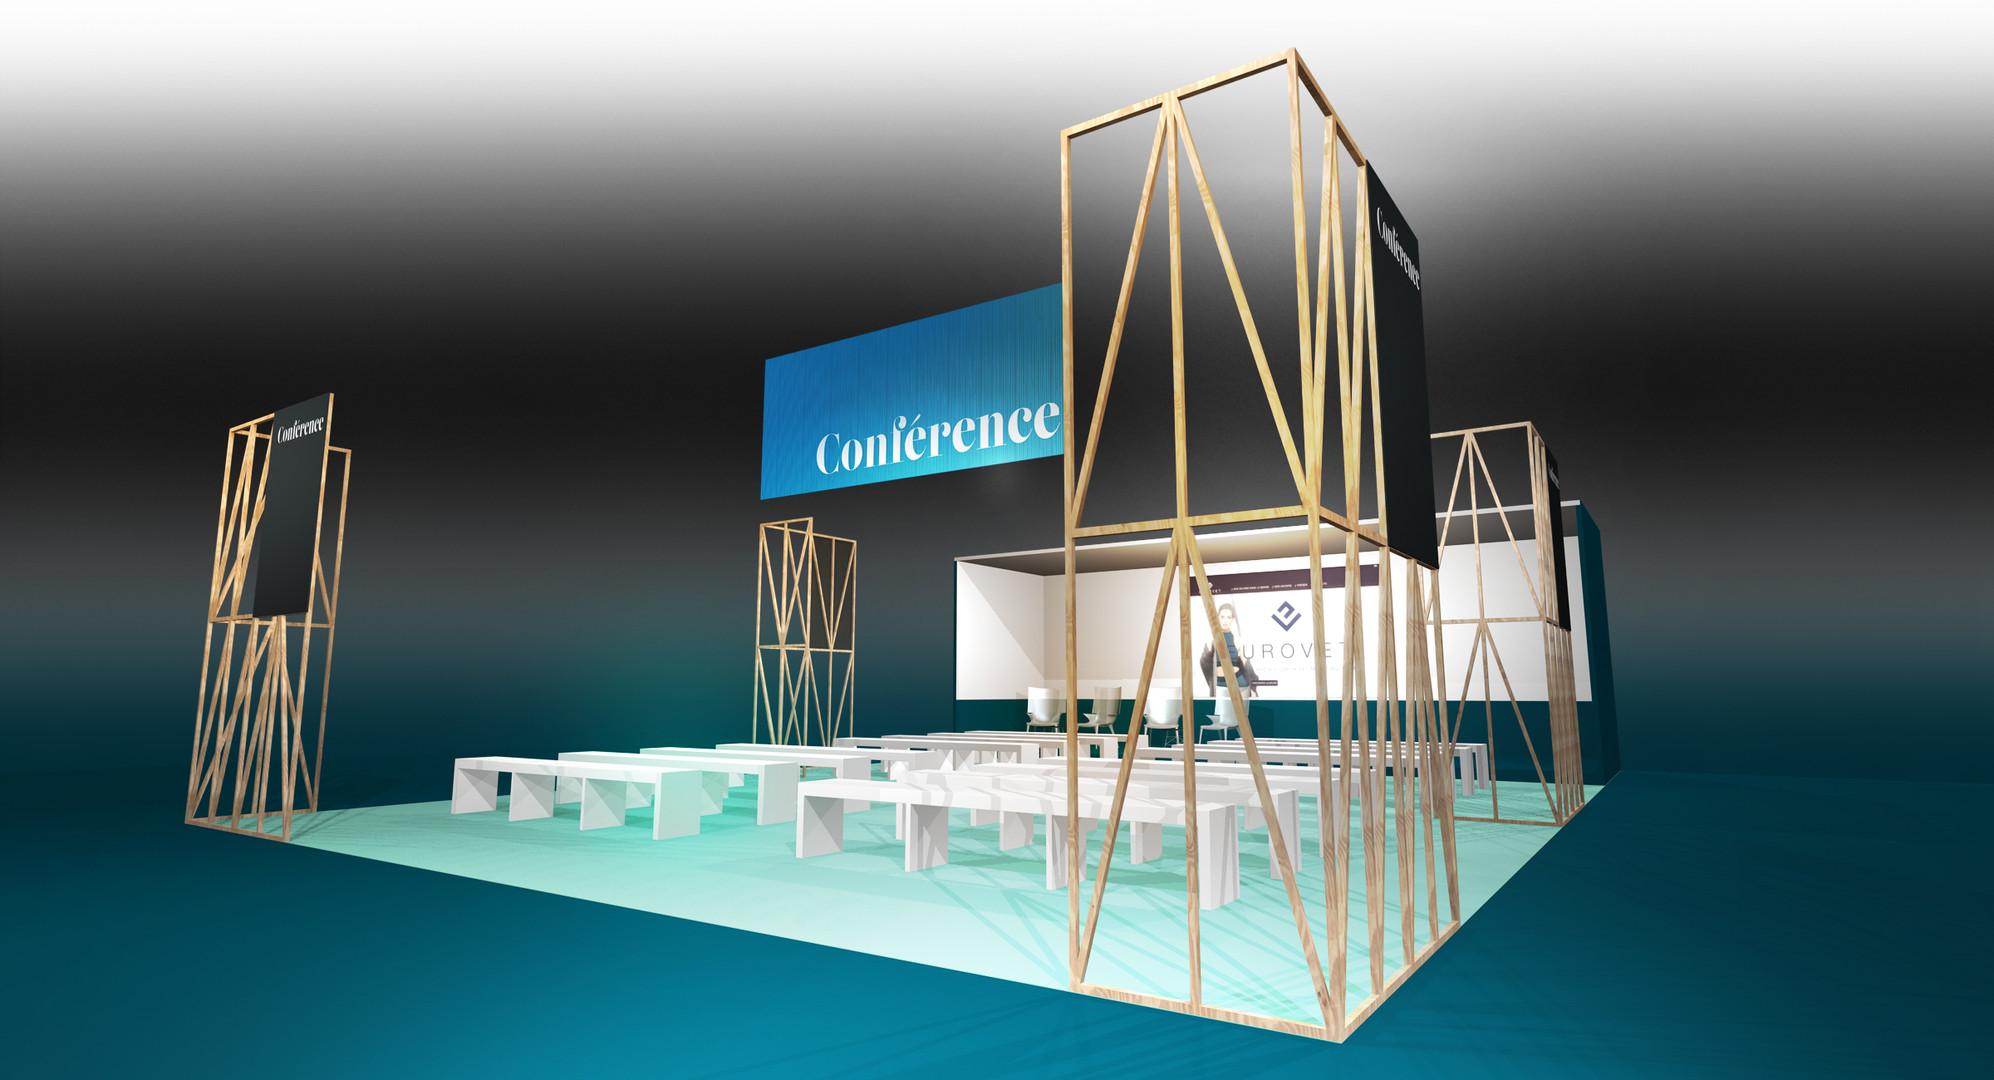 conferences-mc-inter--22-03-17-1.jpg